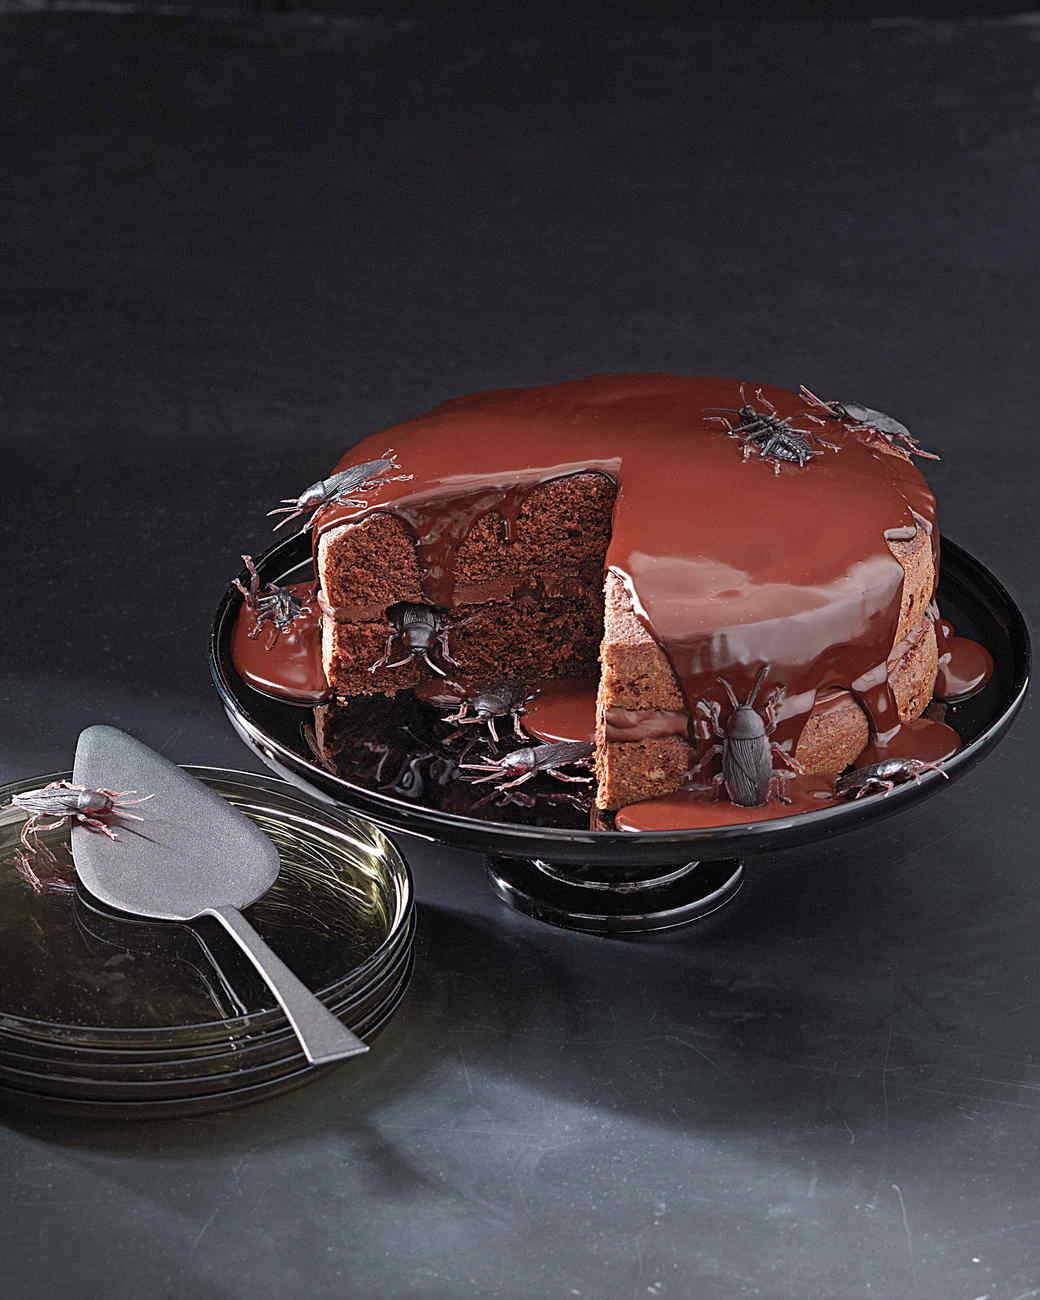 Creepy-Crawly Cake